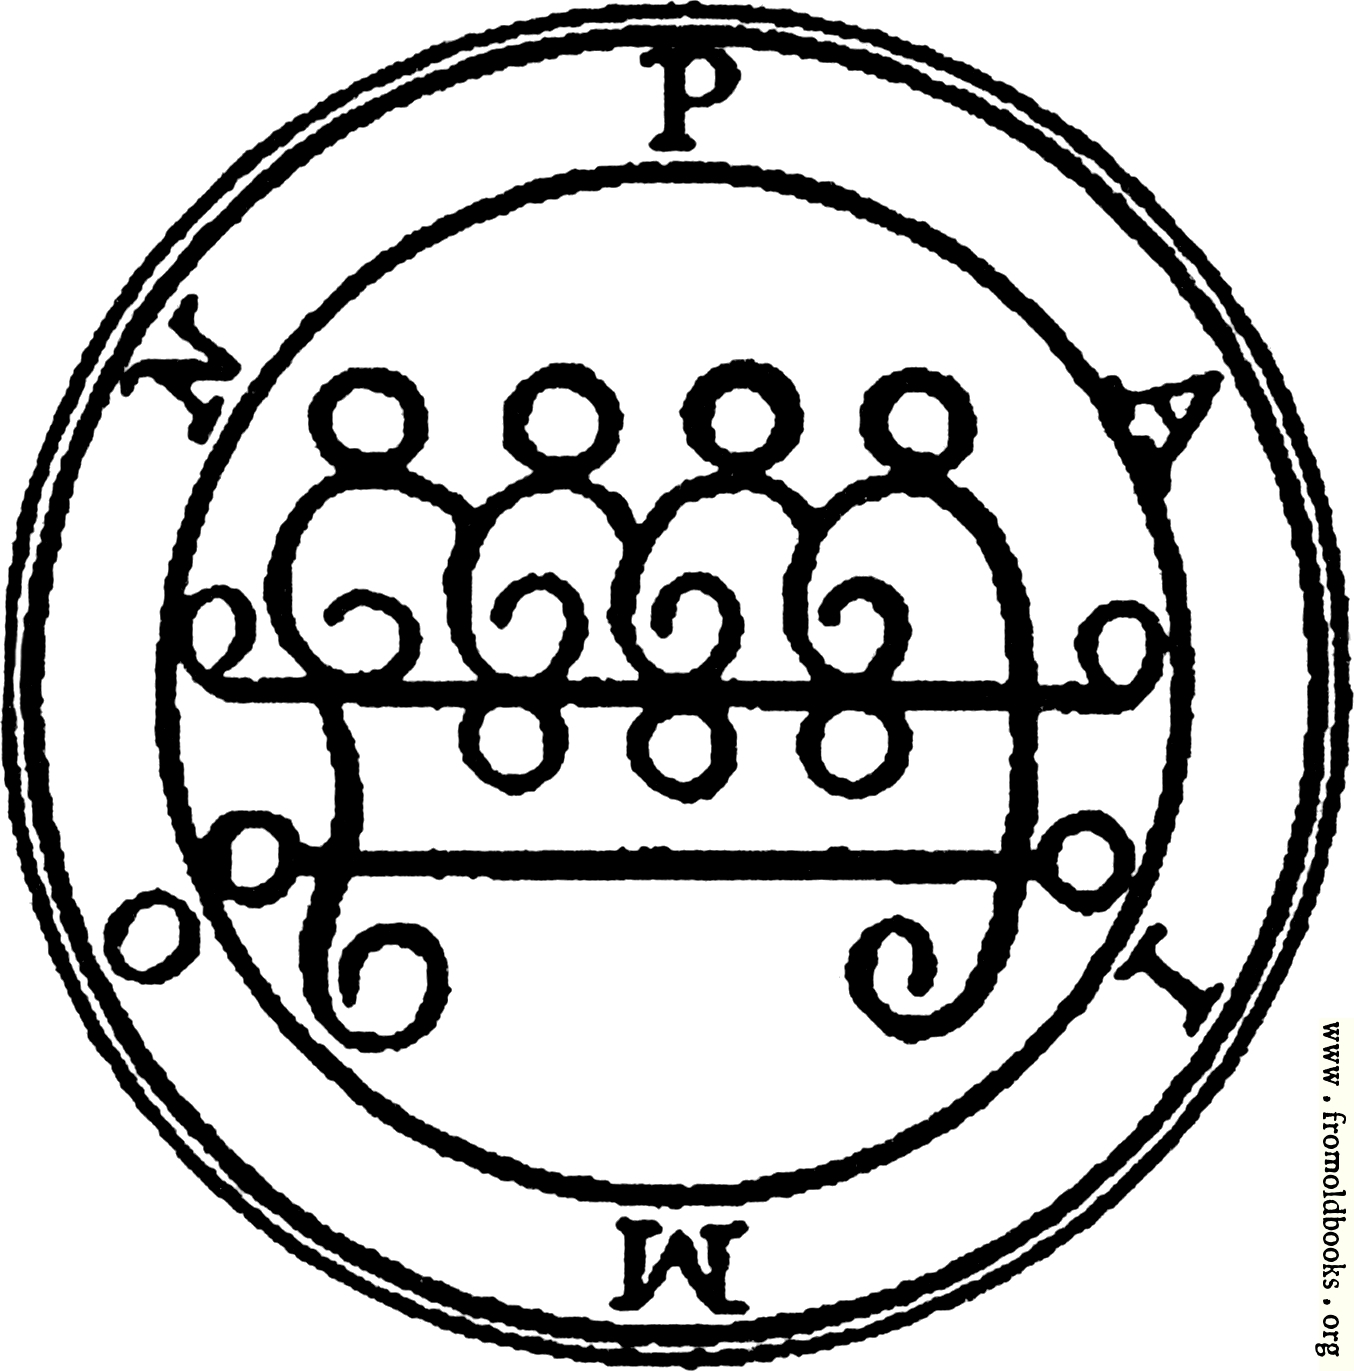 009-Seal-of-Paimon-2-q100-1354x1371.jpg